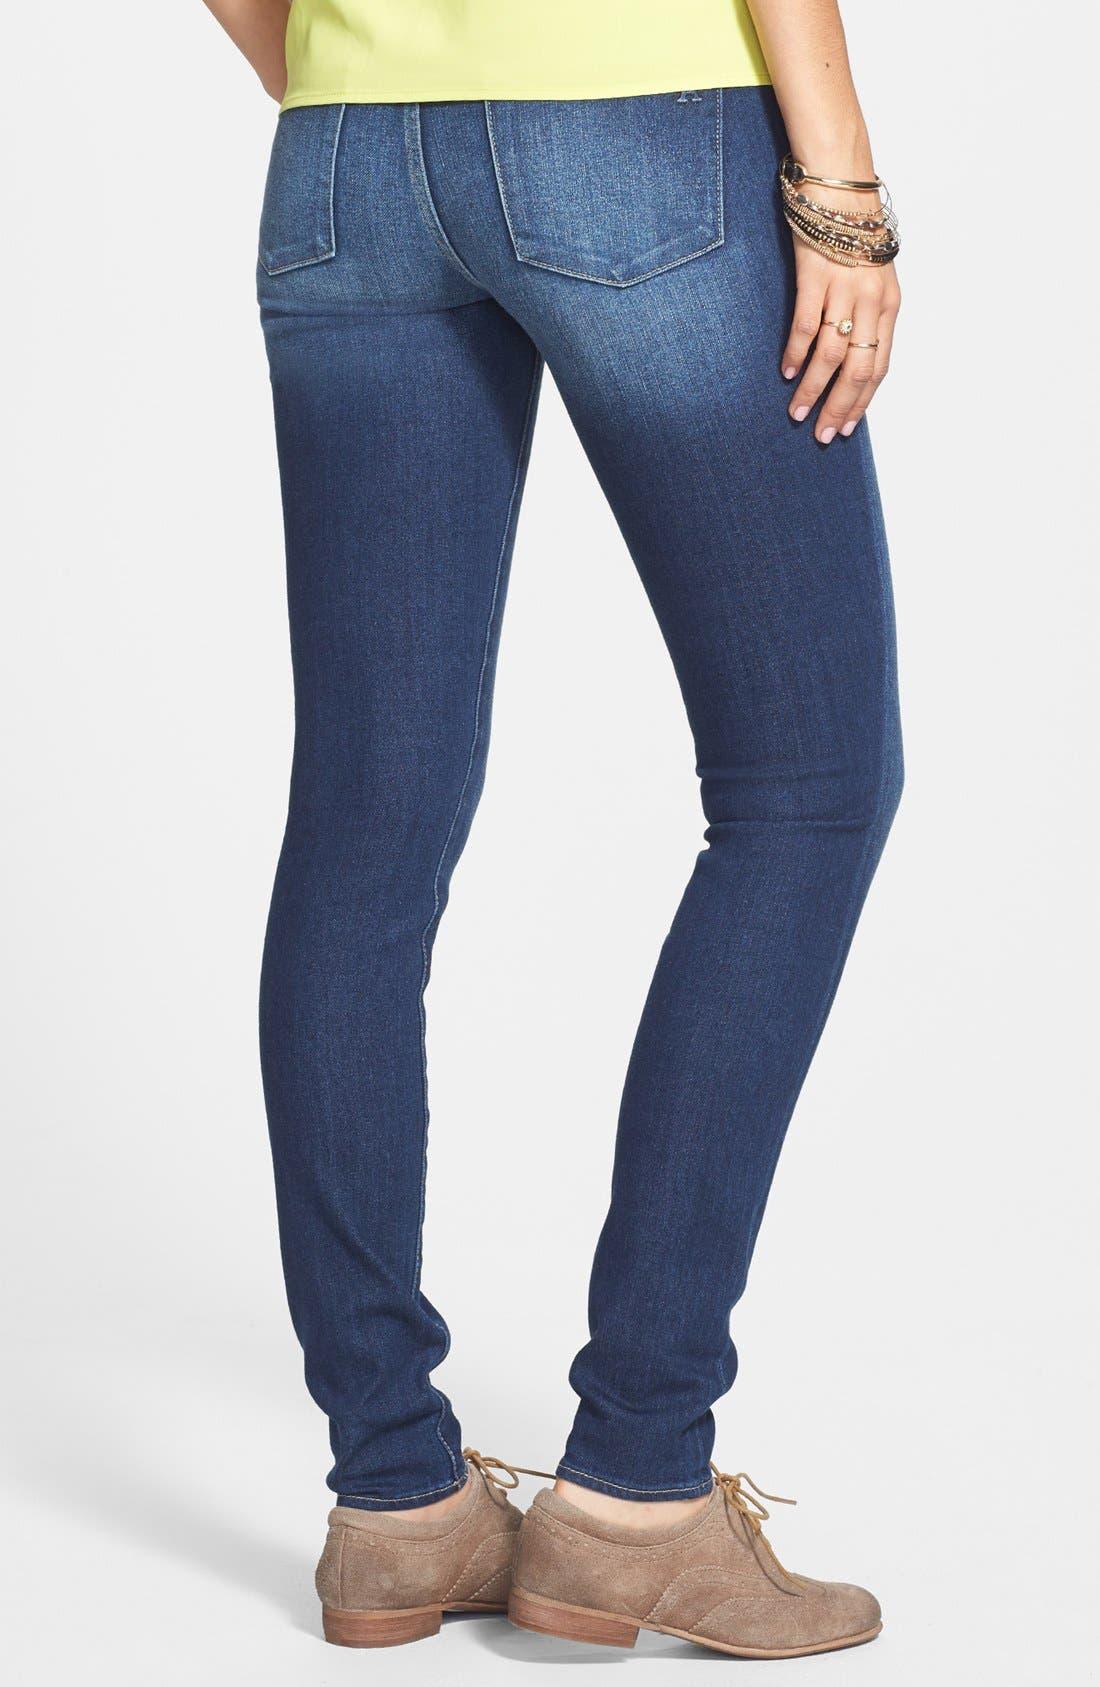 Alternate Image 2  - Articles of Society 'Mya' Skinny Jeans (Dark) (Juniors)